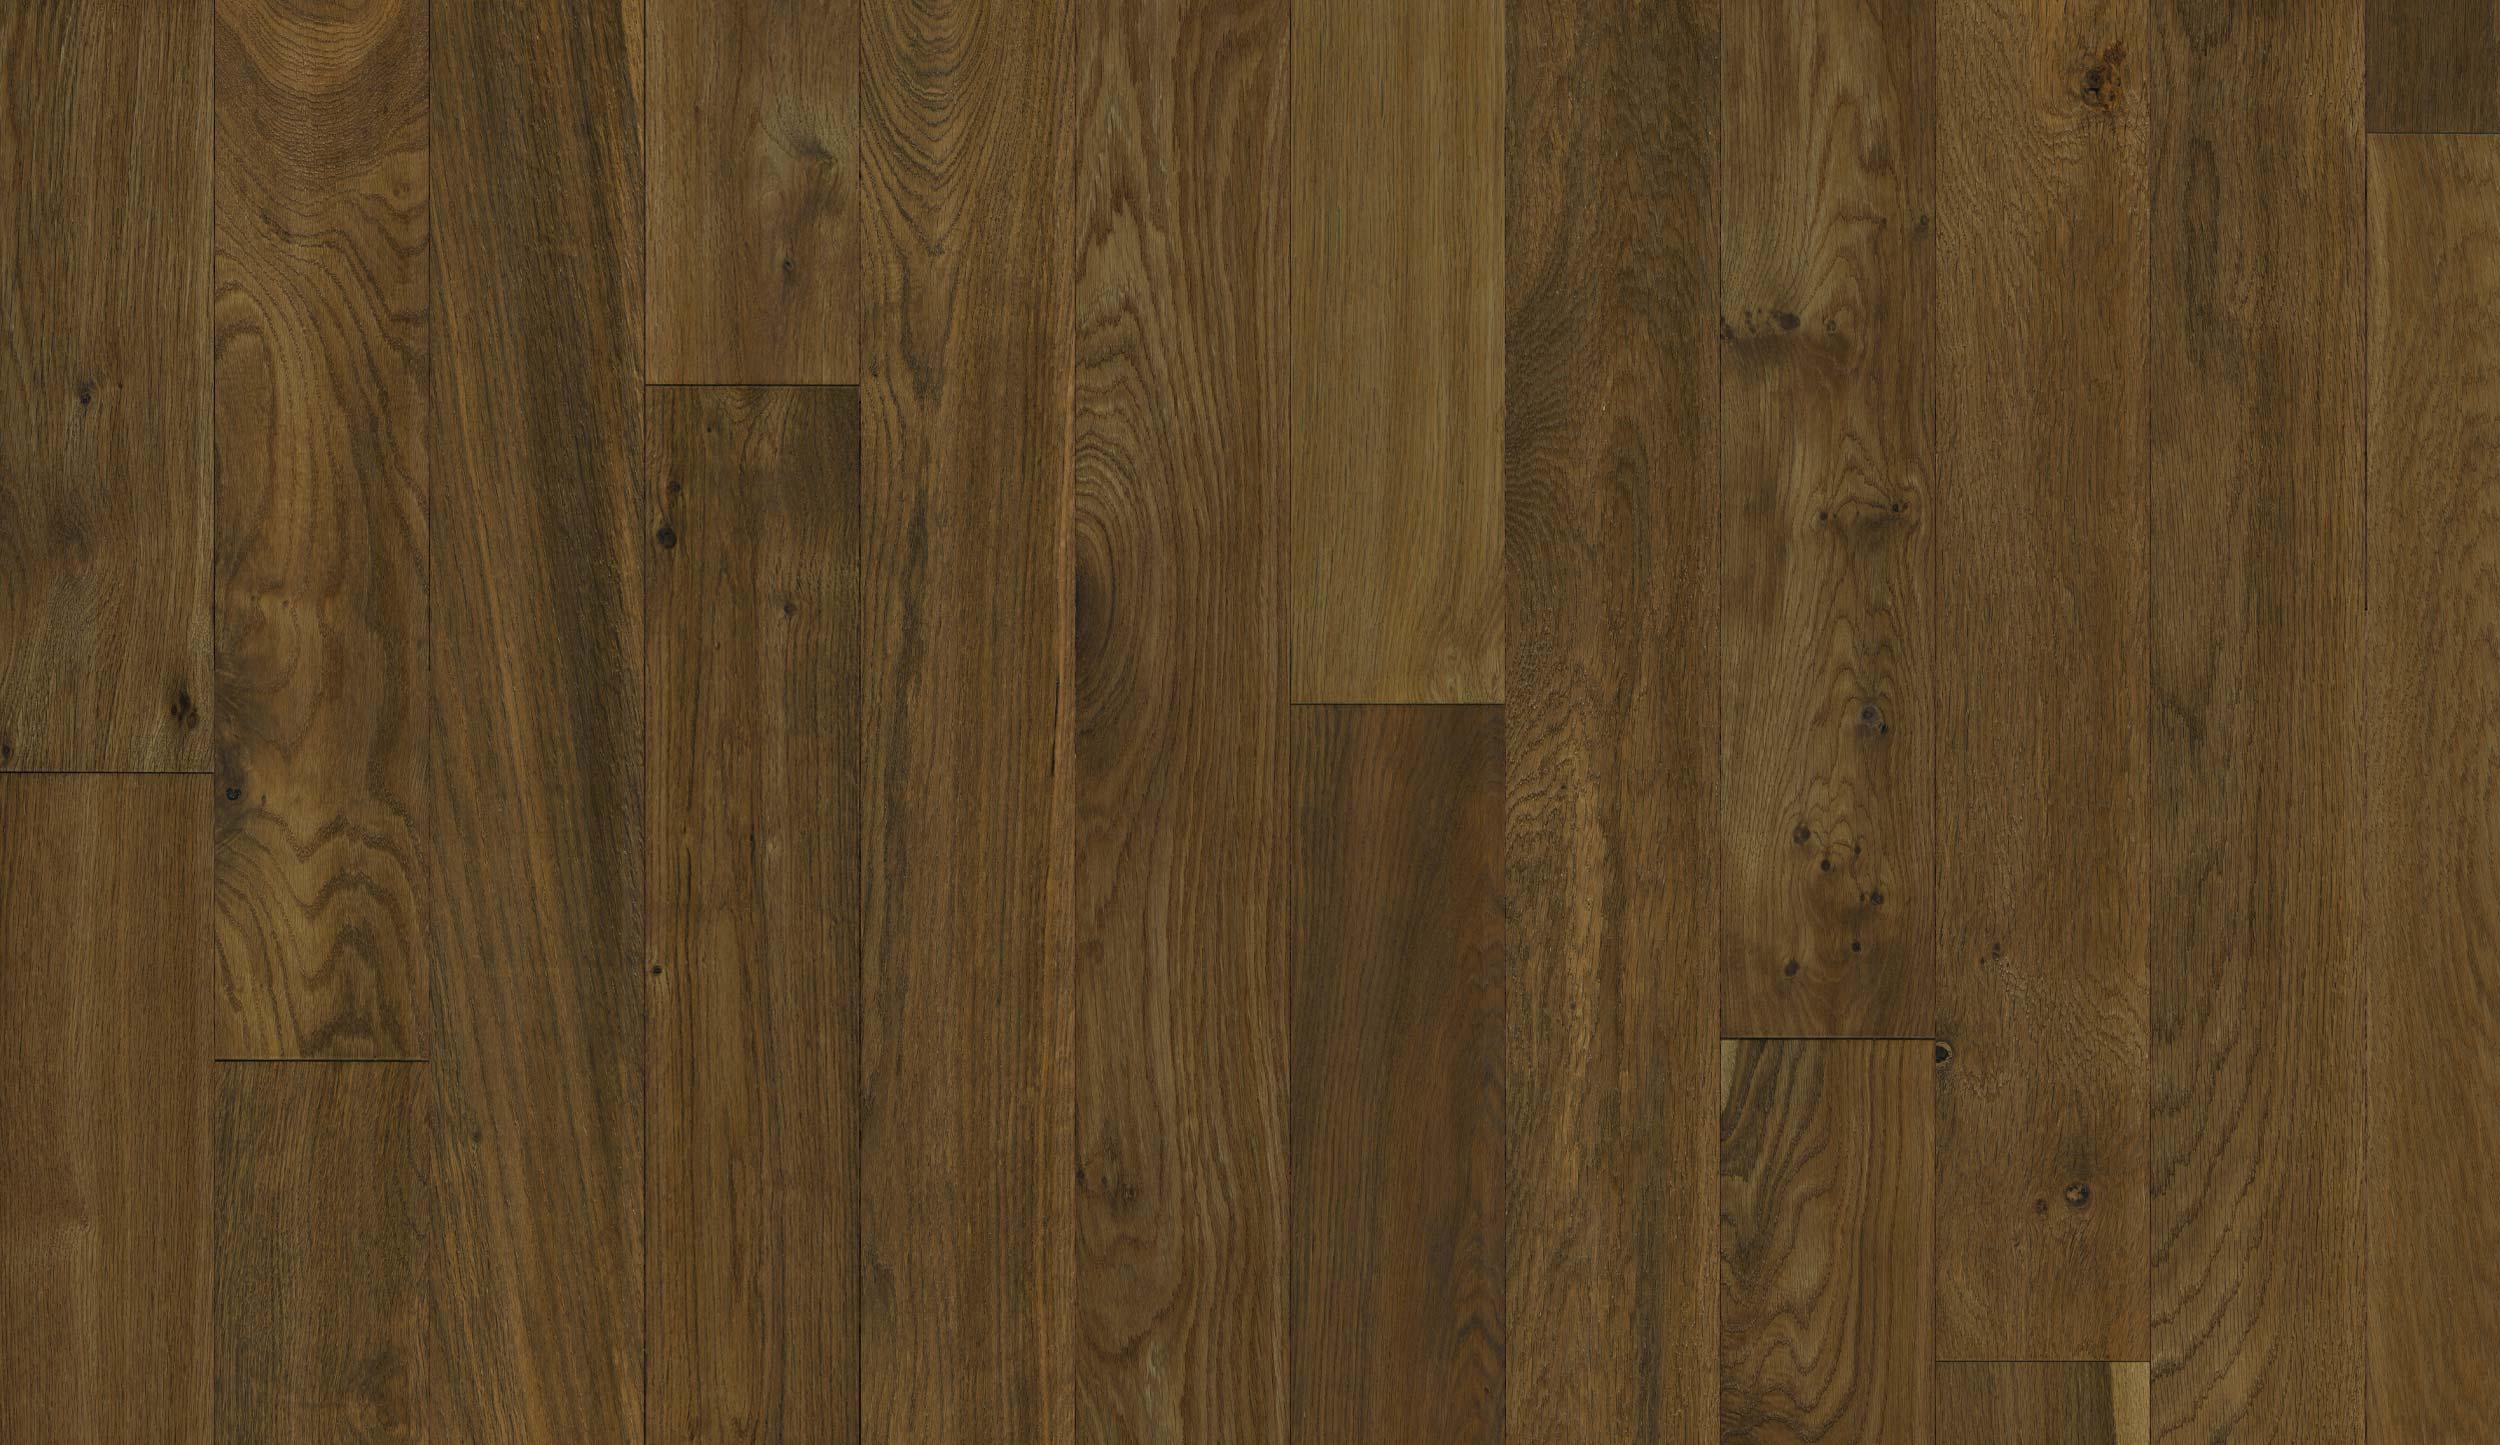 Tabor-hardwood-flooring-profile_swatch